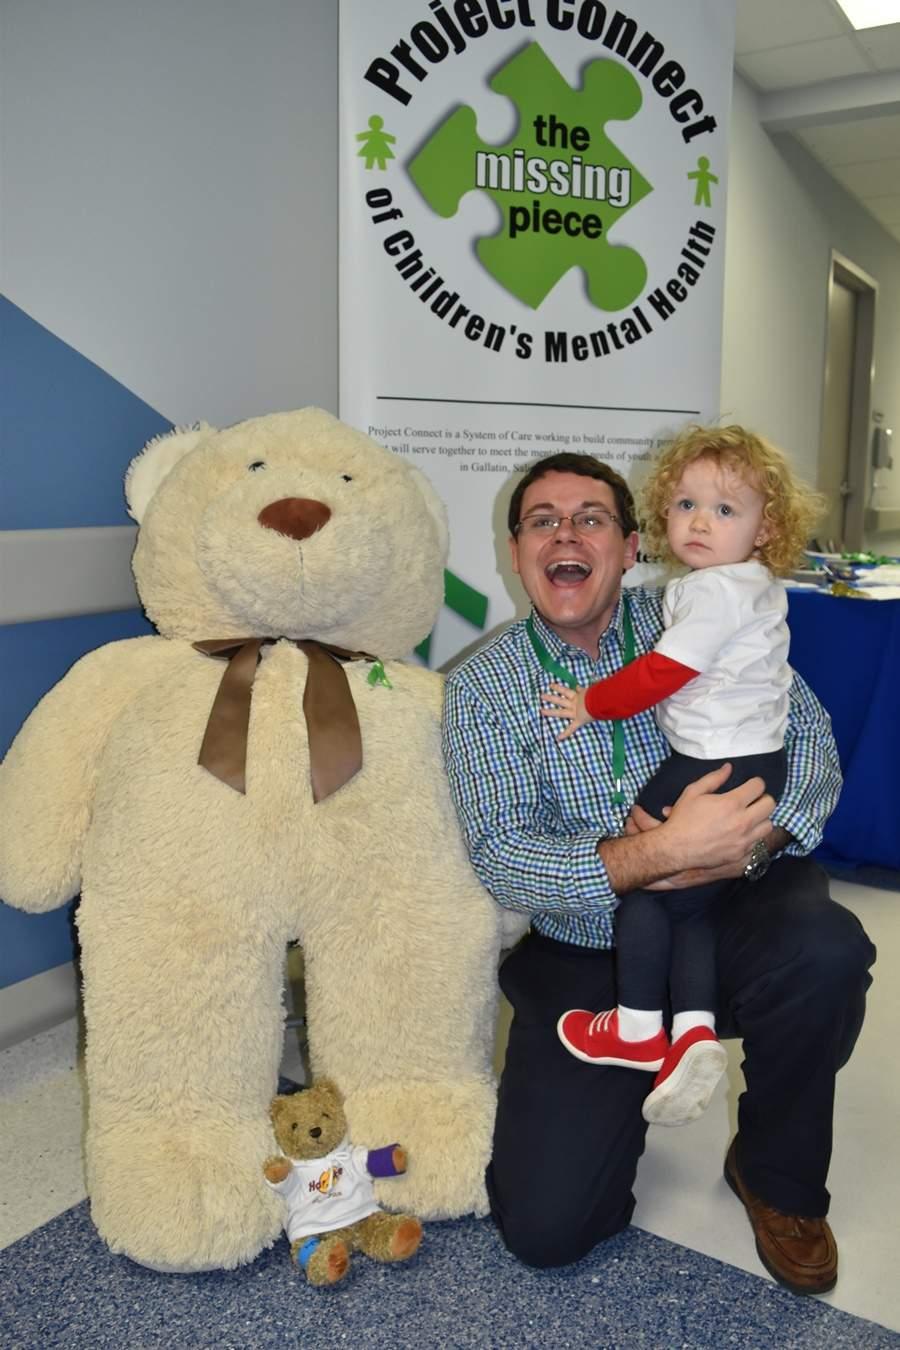 Mattie Buckman of Eldorado sits with her father, Dr. Matt Buckman from Egyptian Health Department, by a giant teddy bear at Harrisburg Medical Center's Teddy Bear Care Fair Saturday at HMC.